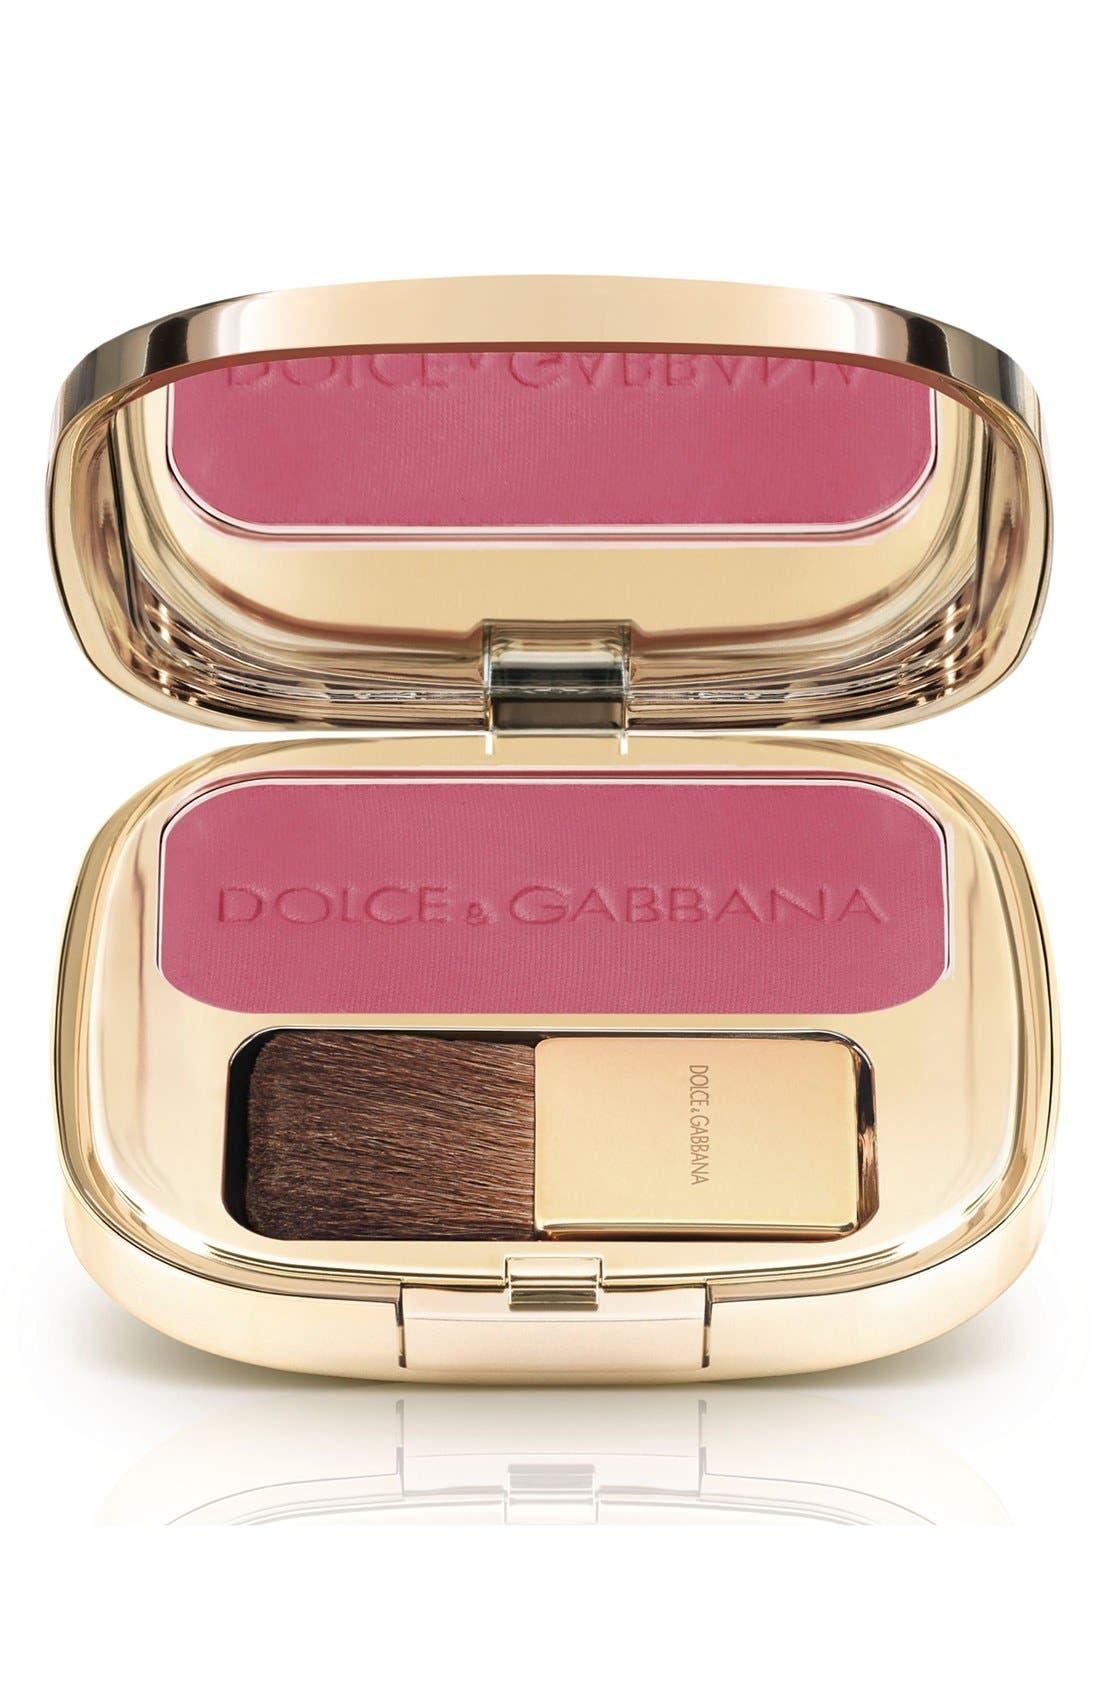 Dolce&Gabbana Beauty Luminous Cheek Color Blush